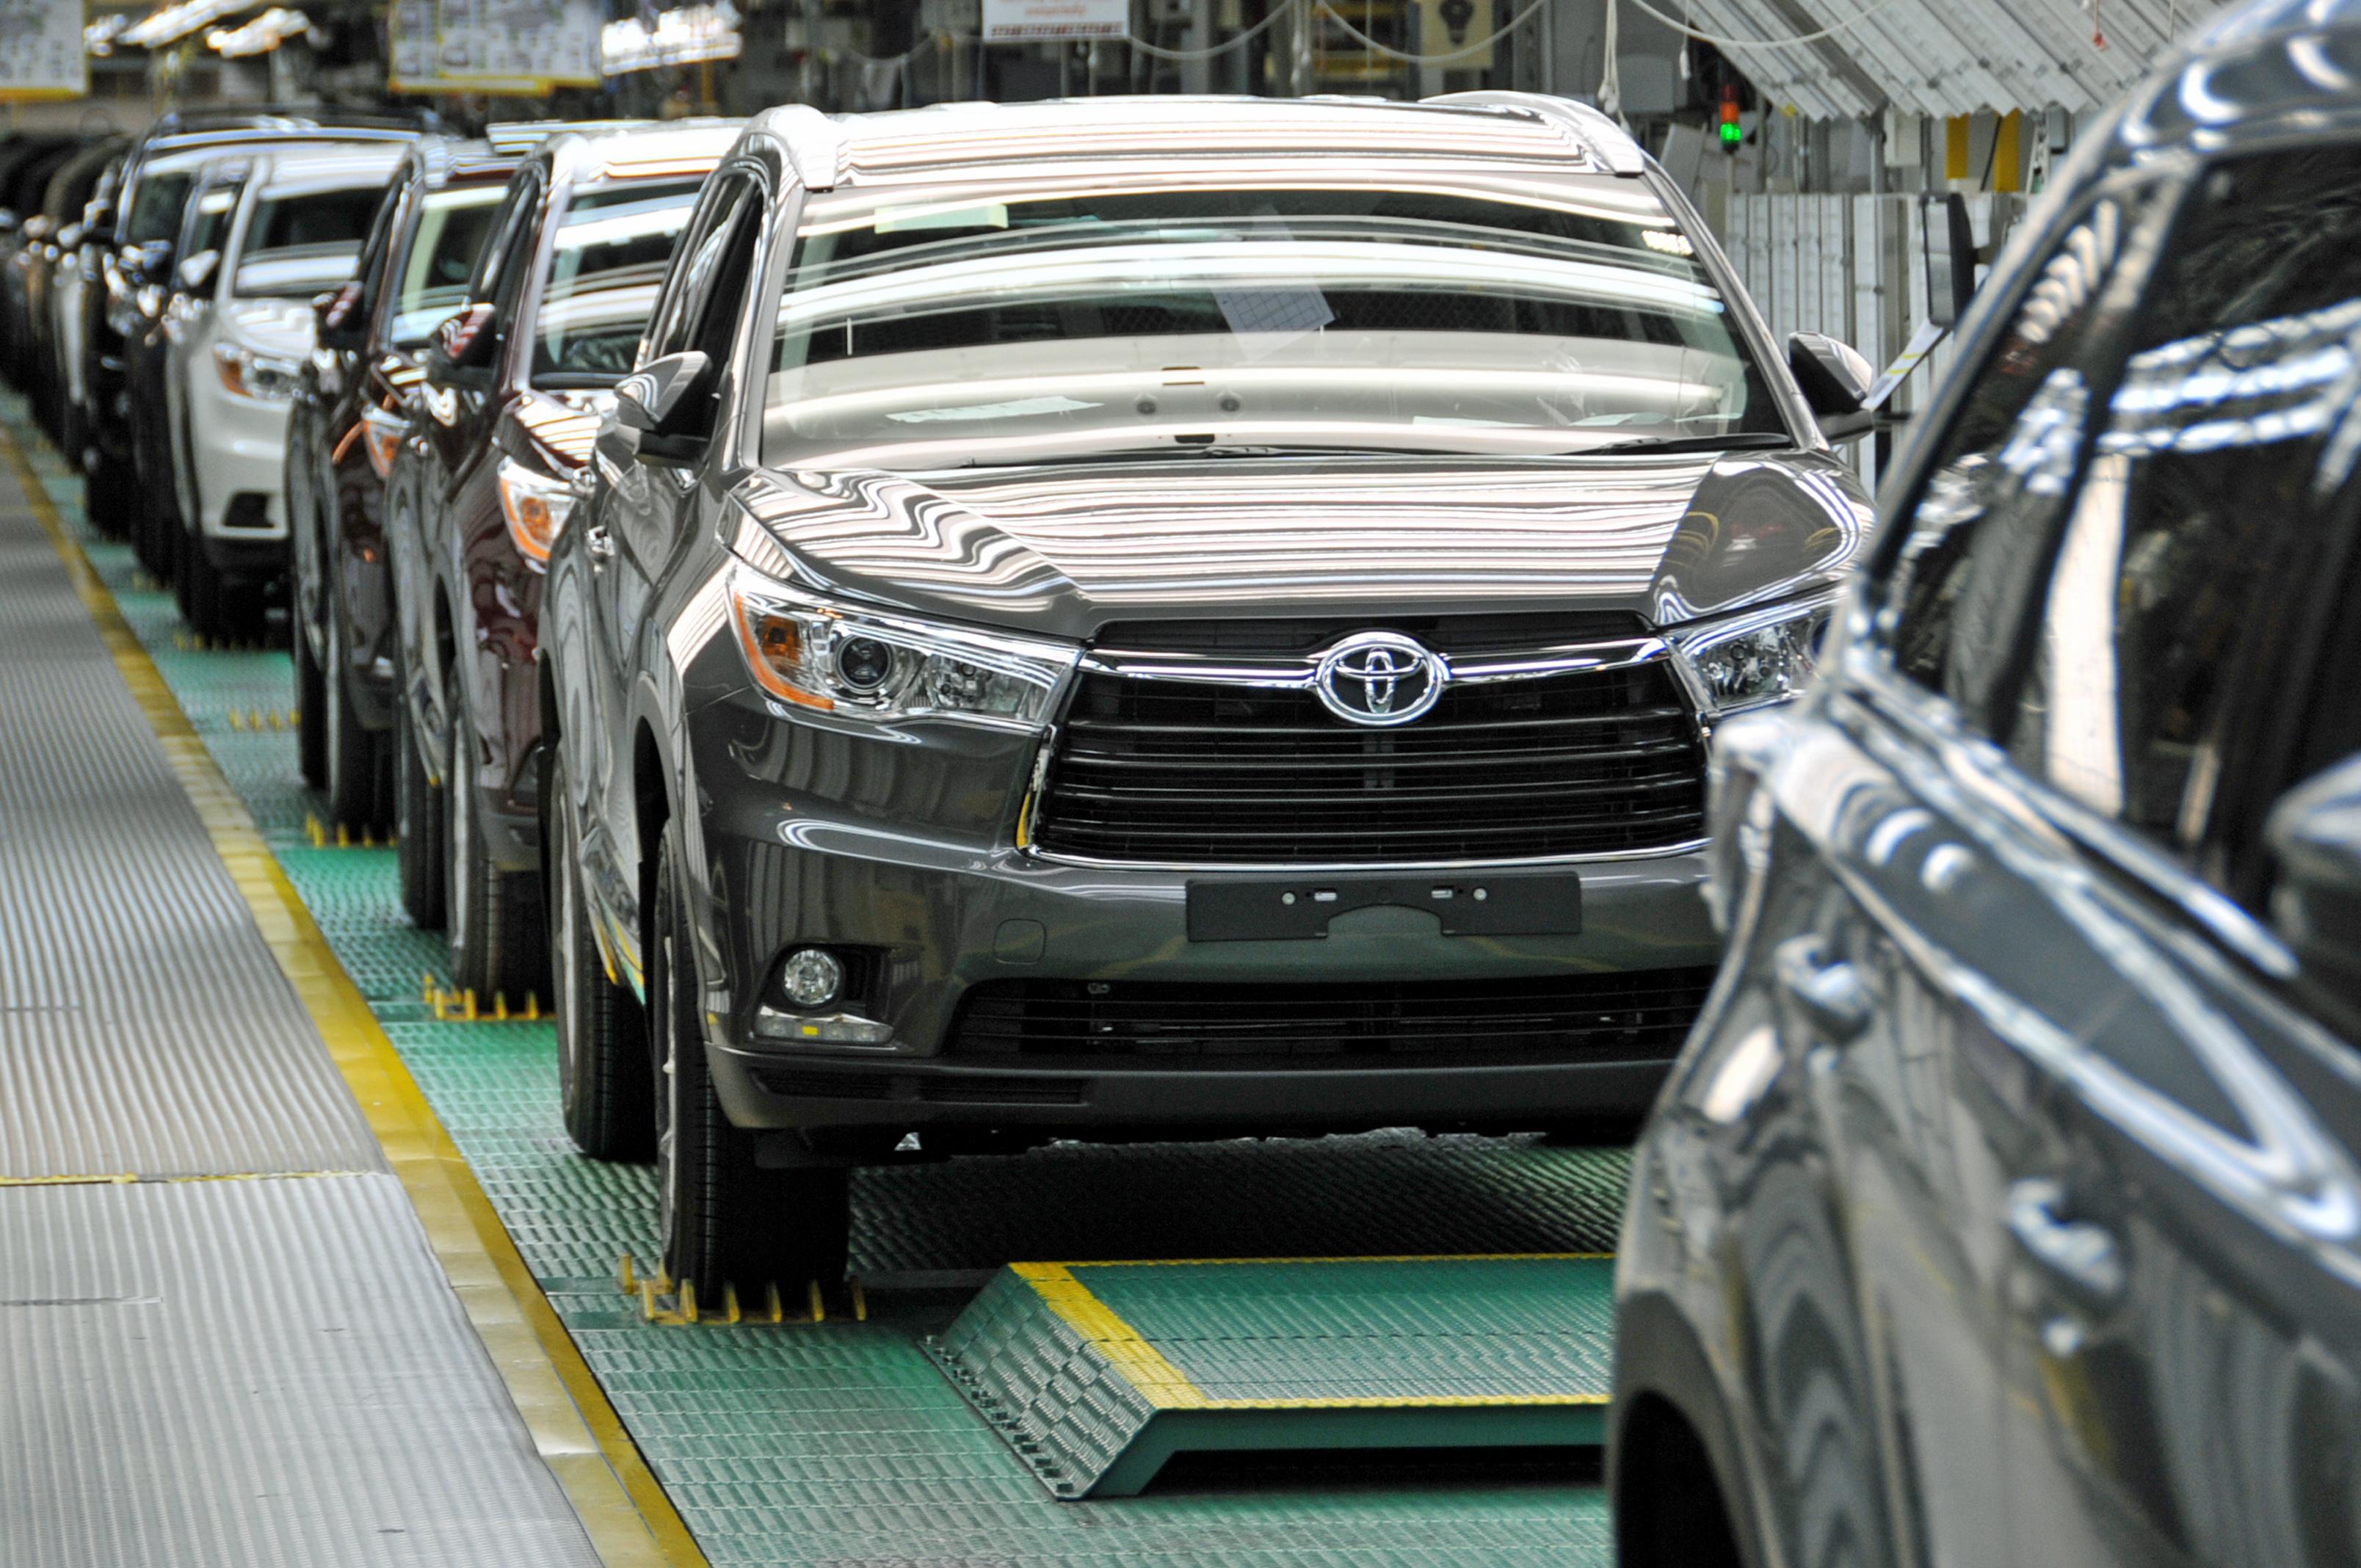 Worldwide sales of Toyota hybrids surpass 10 million units